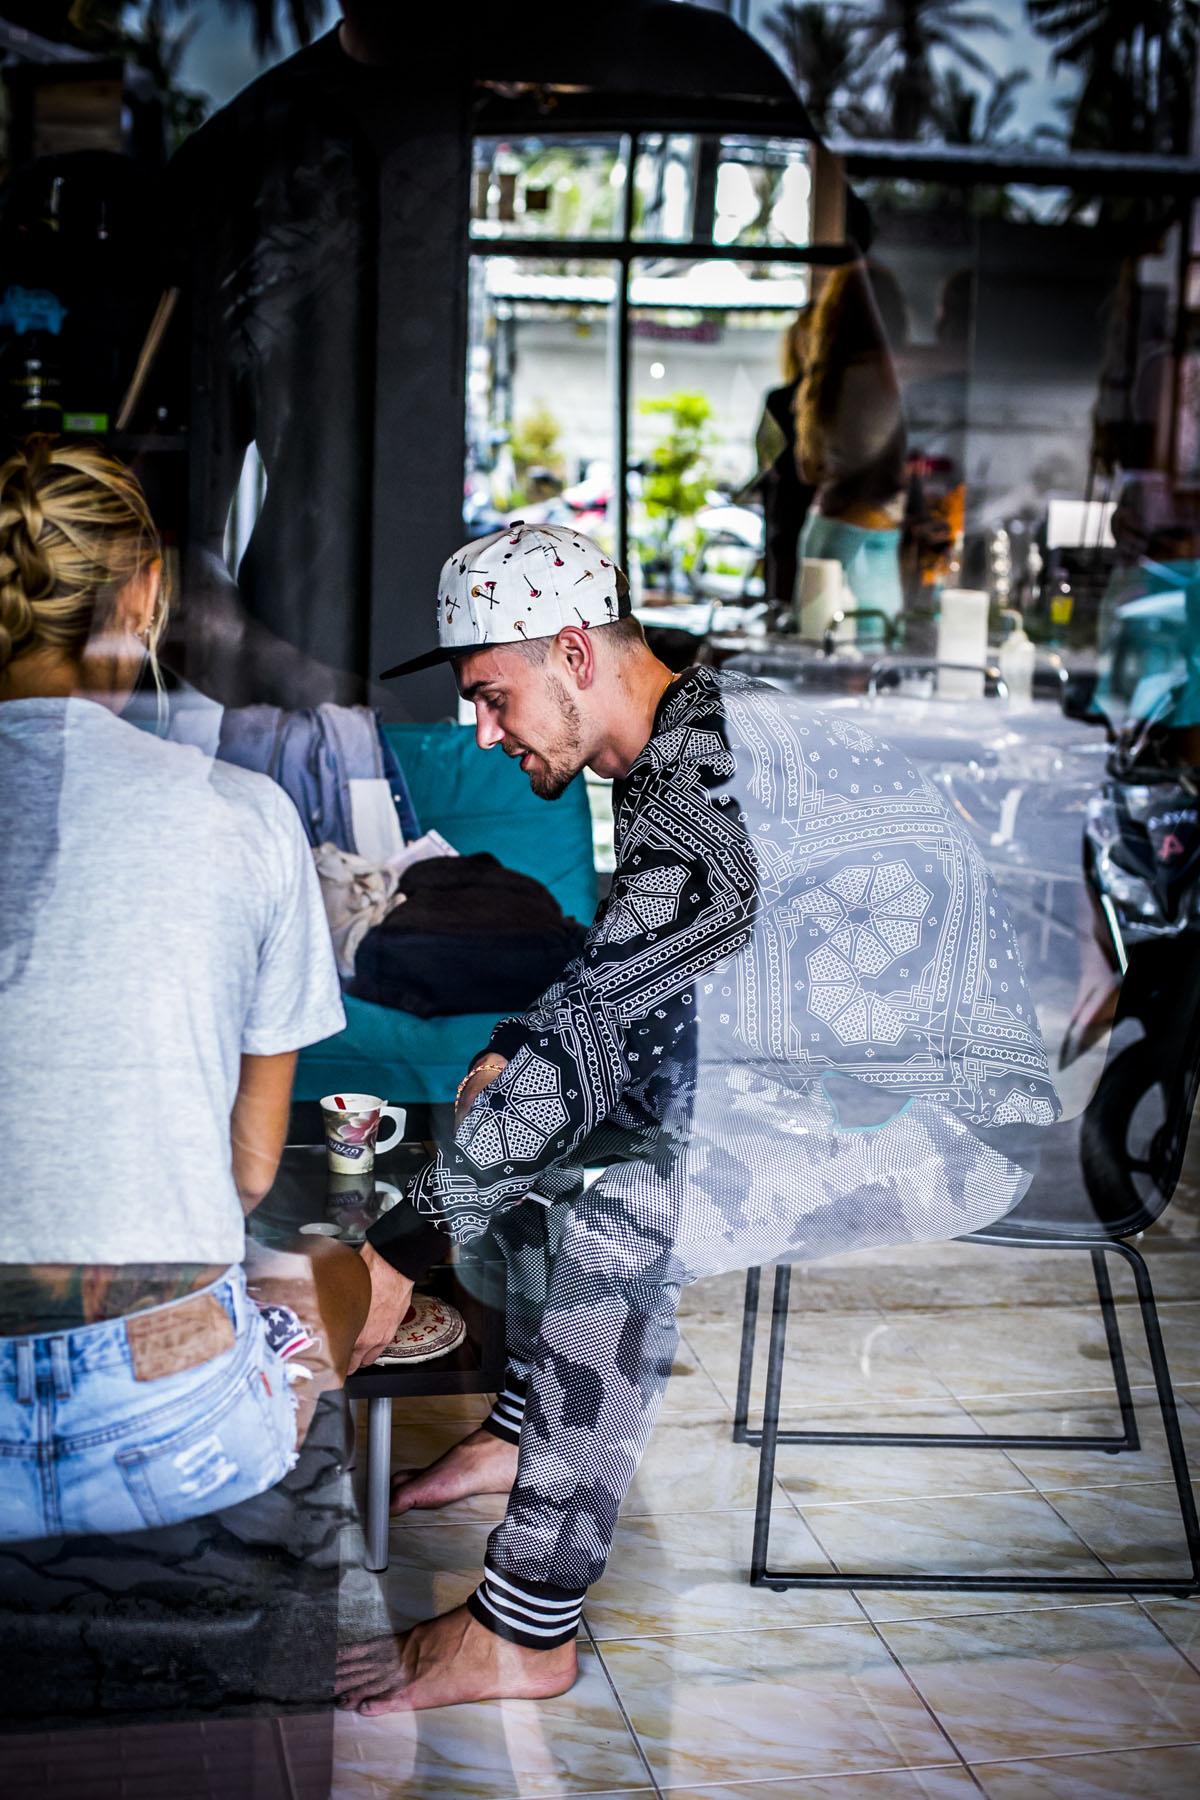 Bogatyr Tattoo in Thailand - Fotografin Guelten Hamidanoglu Koeln portraits  3952